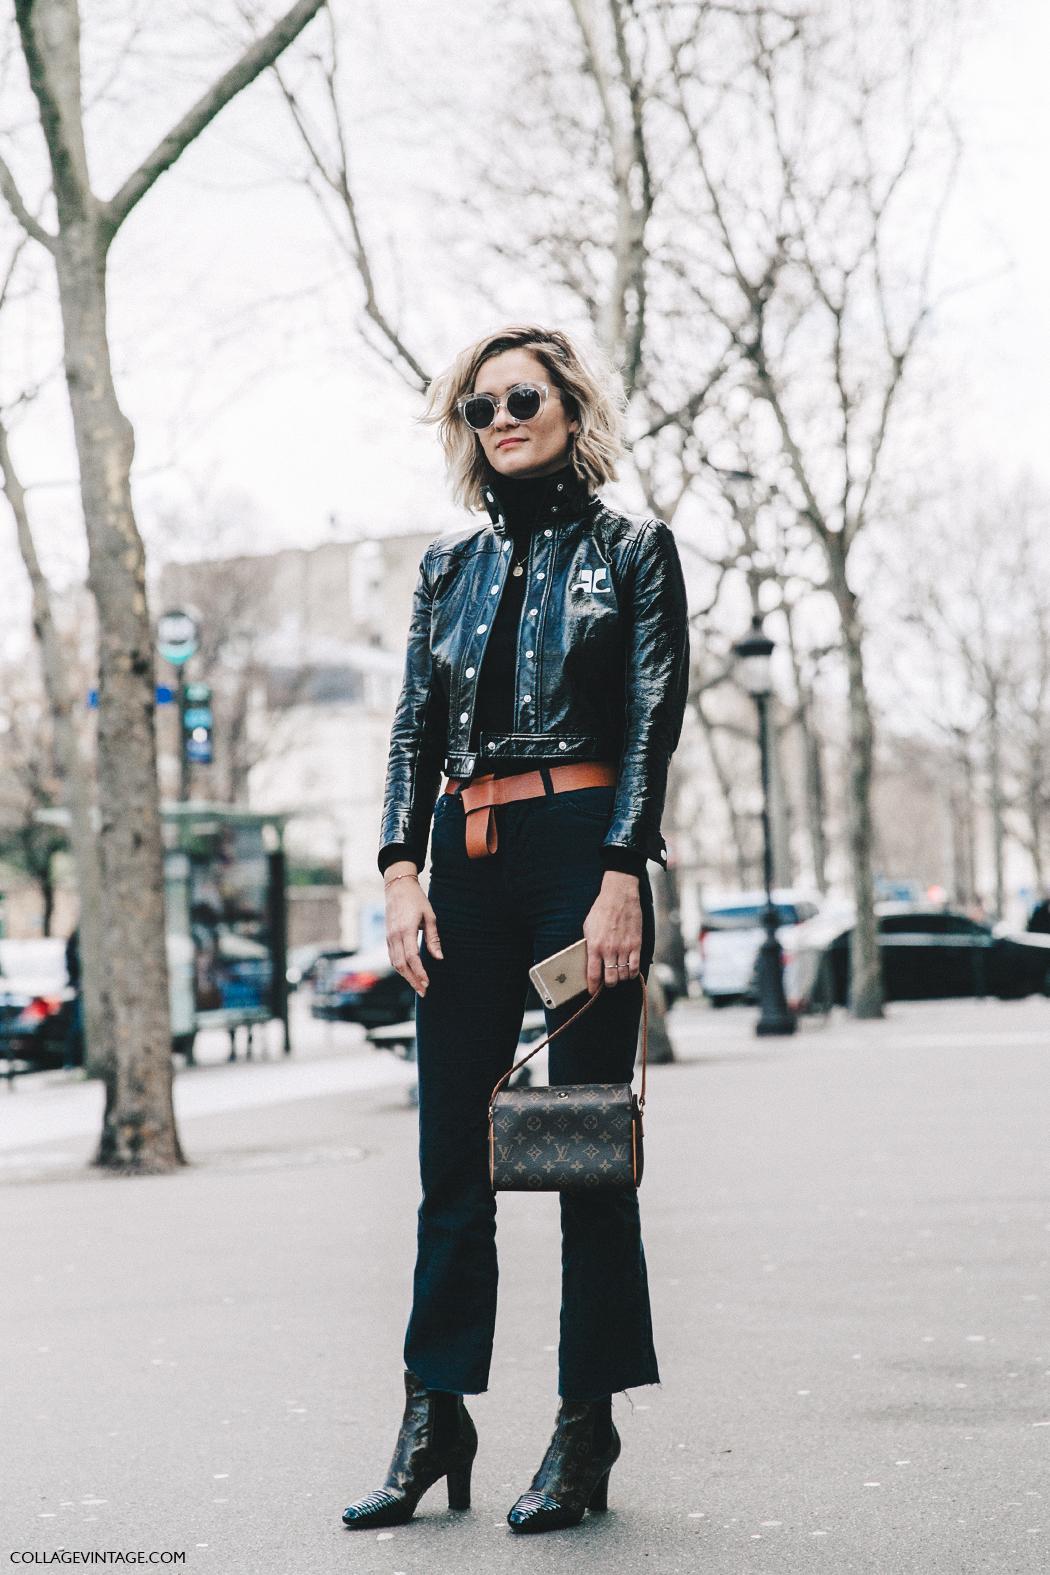 PFW-Paris_Fashion_Week_Fall_2016-Street_Style-Collage_Vintage-Adenorah-Louis_Vuitton-2